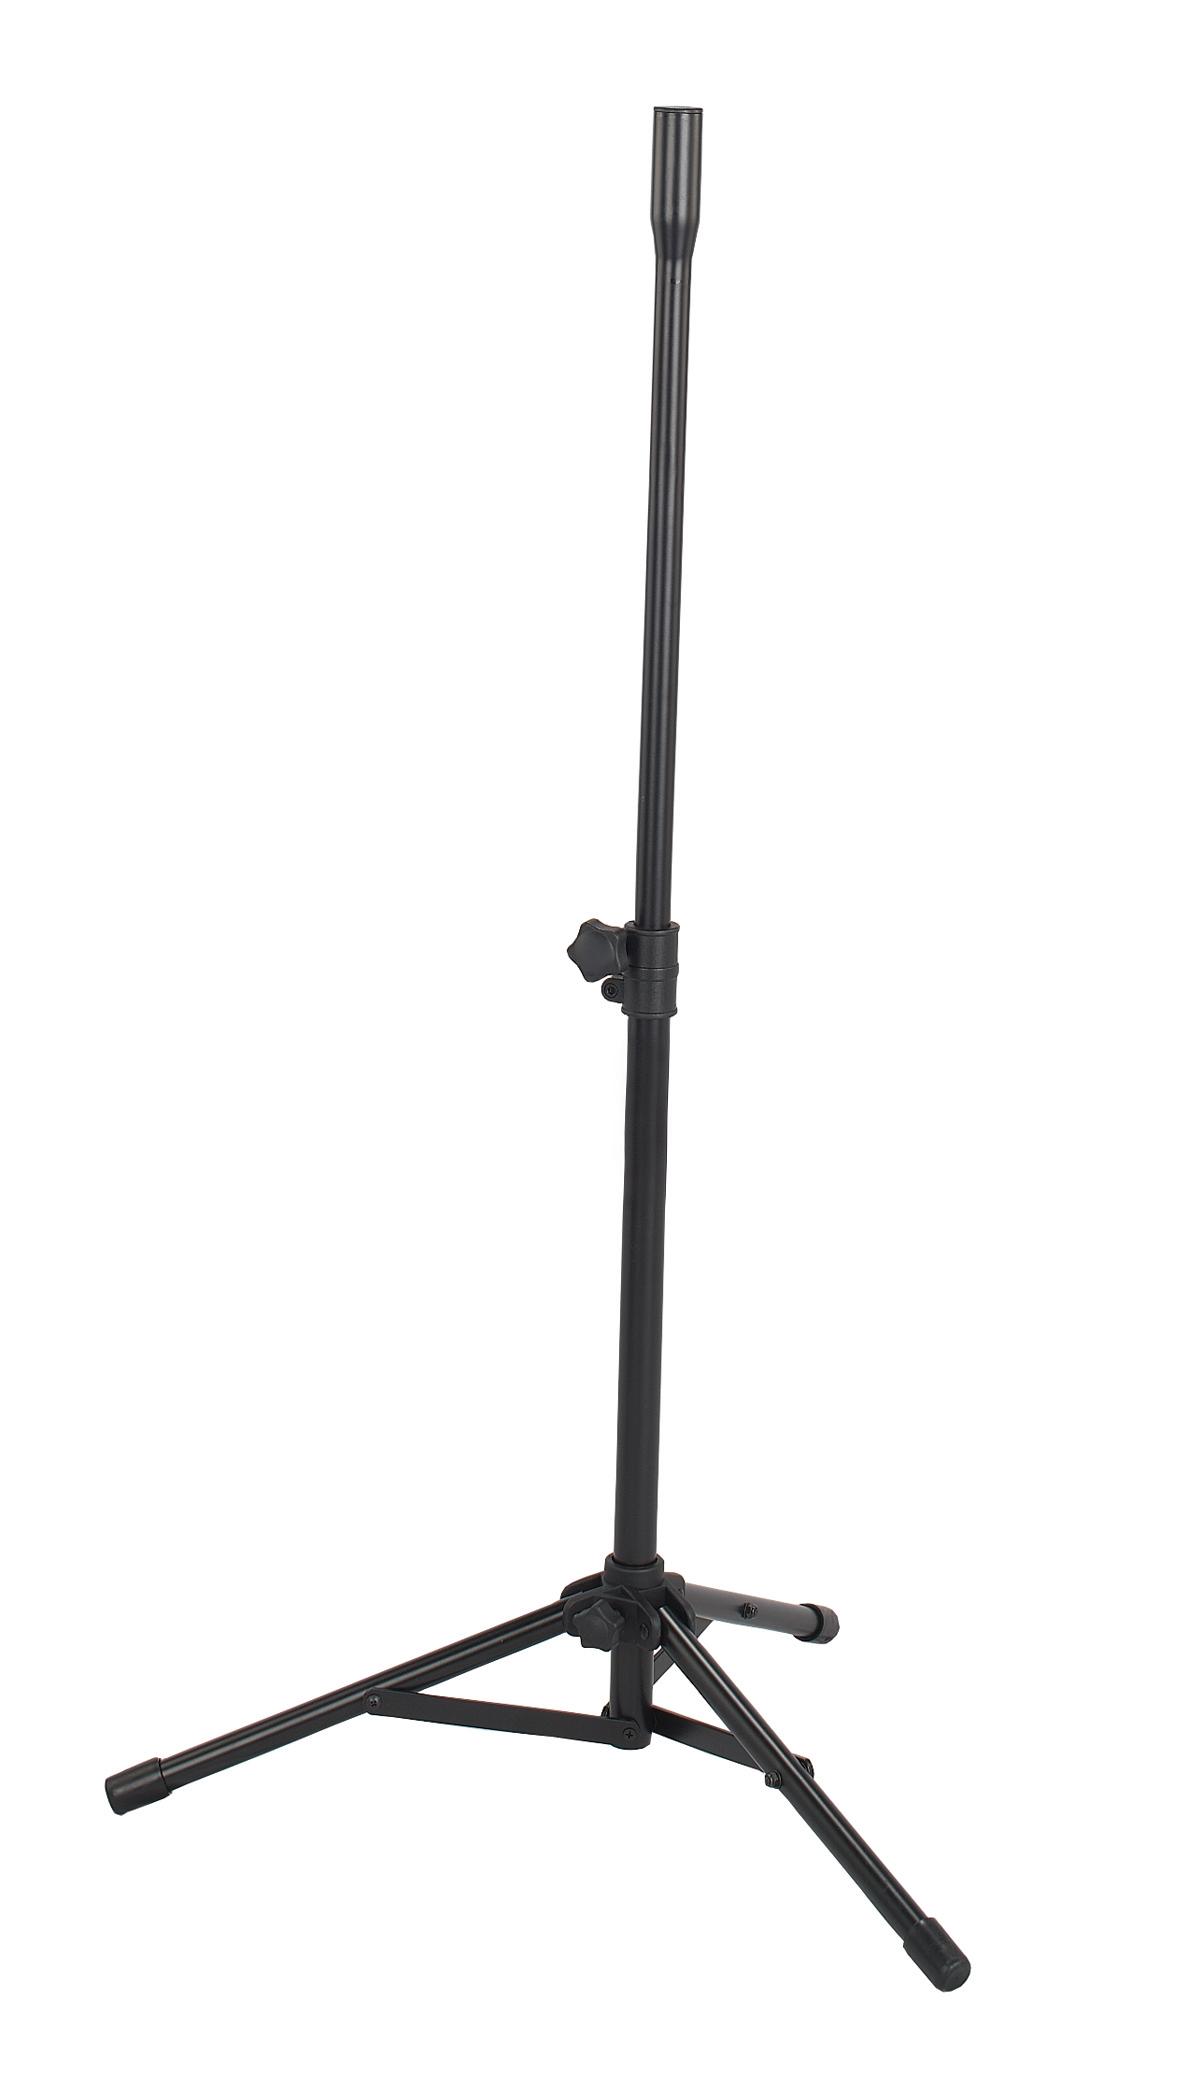 Amplivox S1090 Compact Adjustable Tripod Speaker Stand